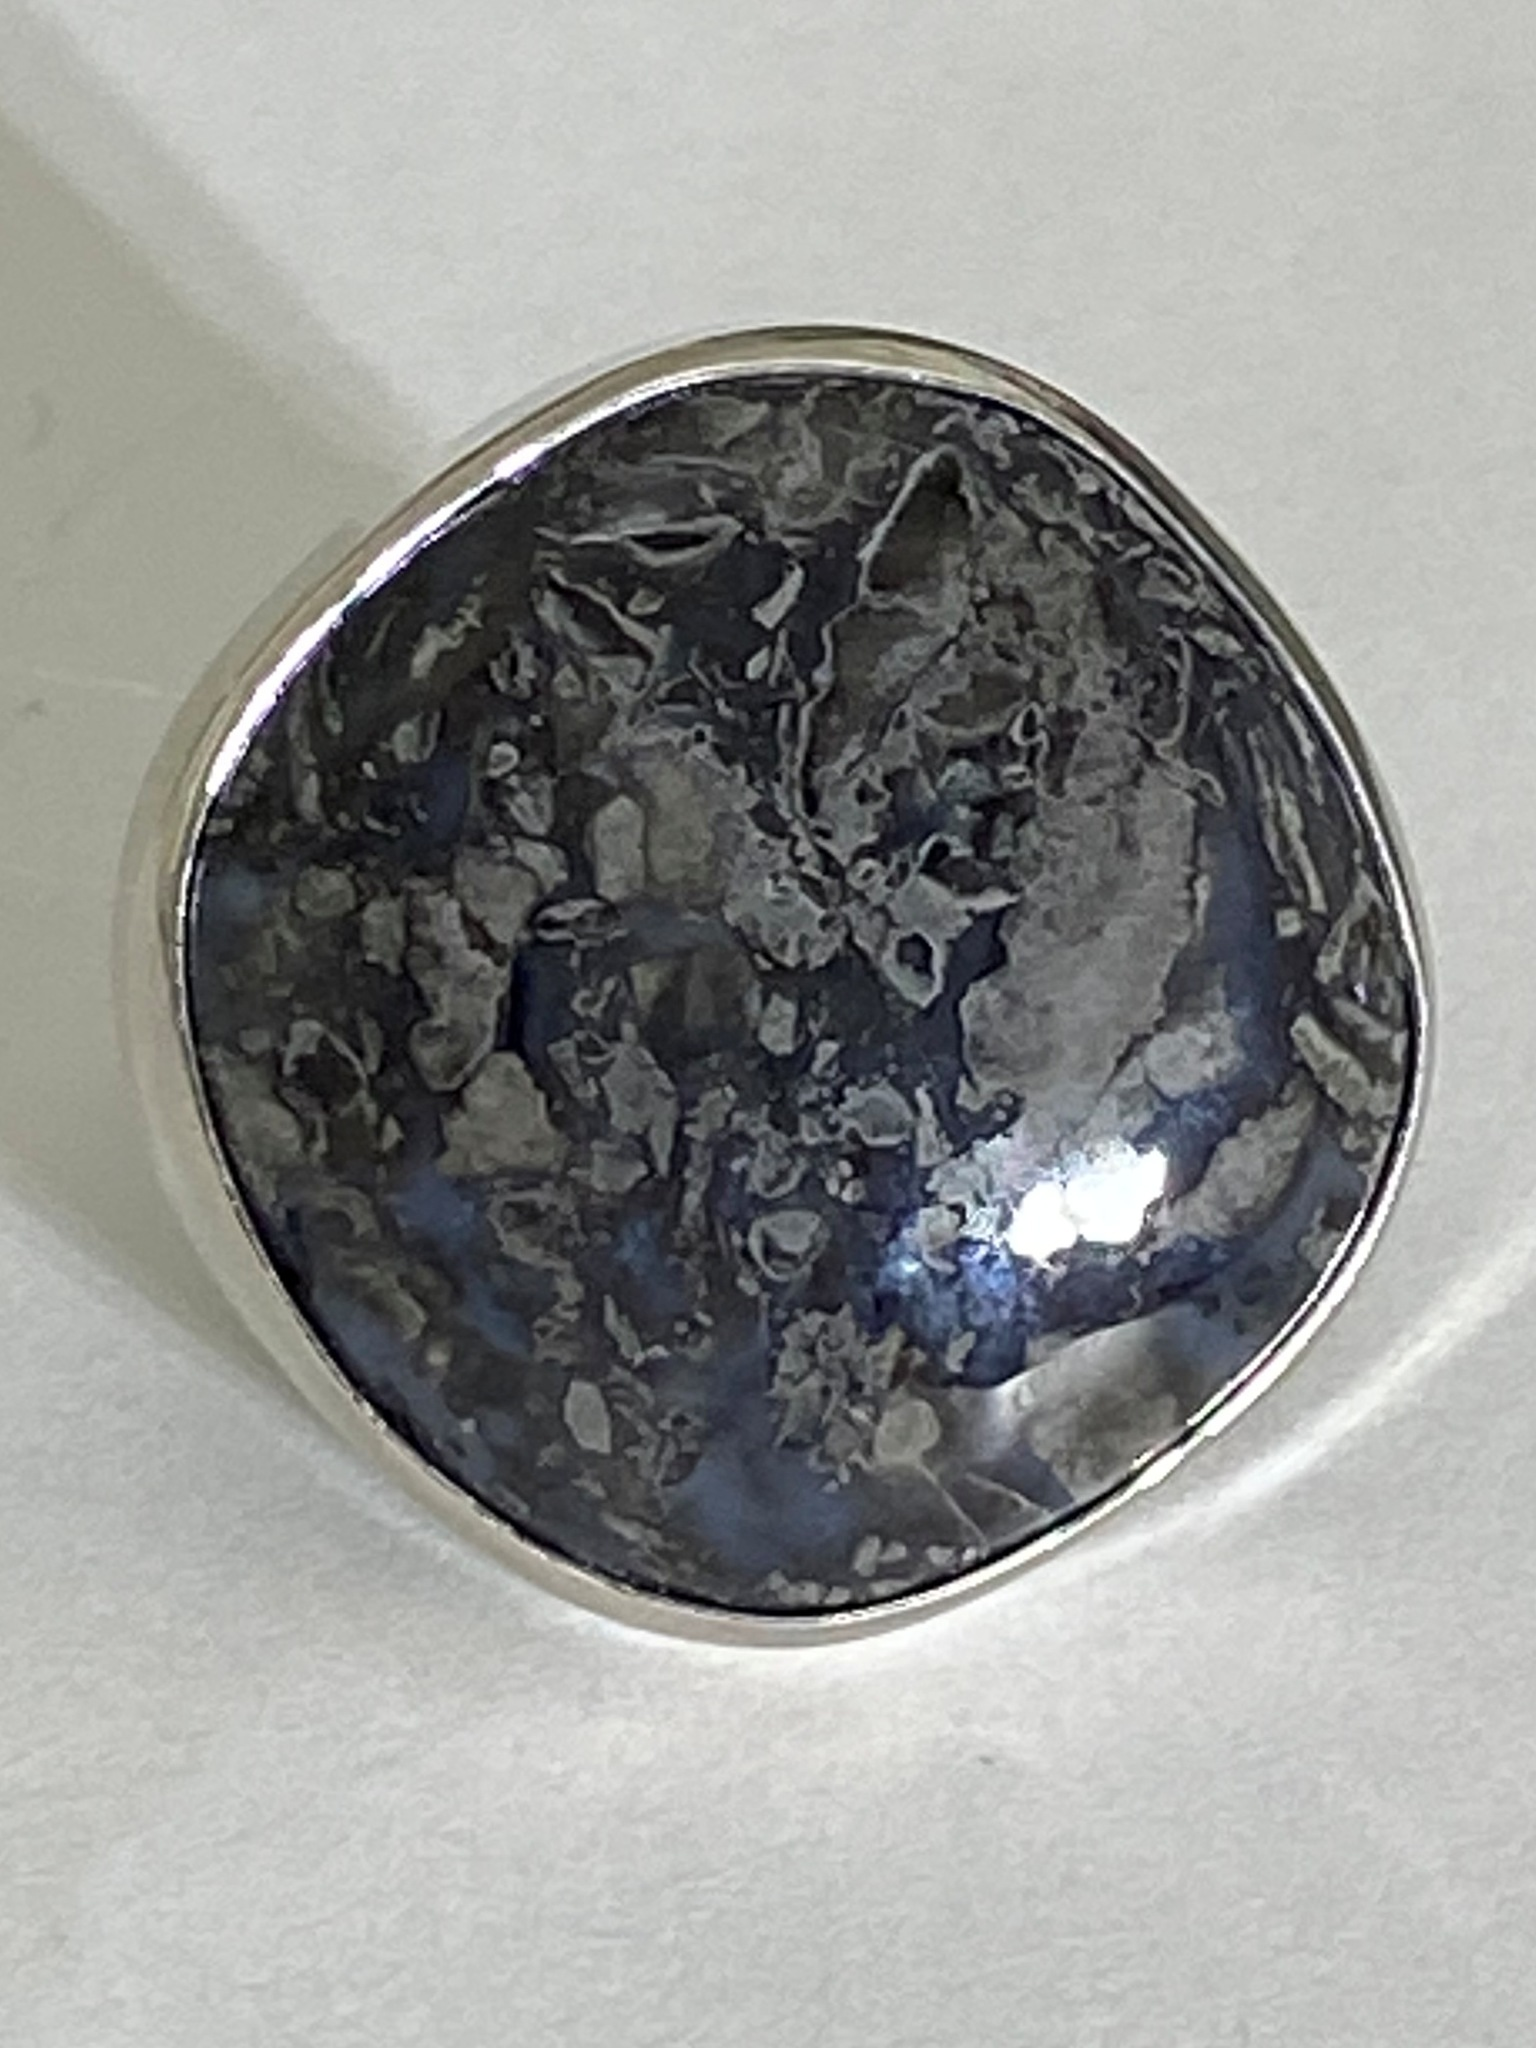 Яшма квадрат (кольцо из серебра)